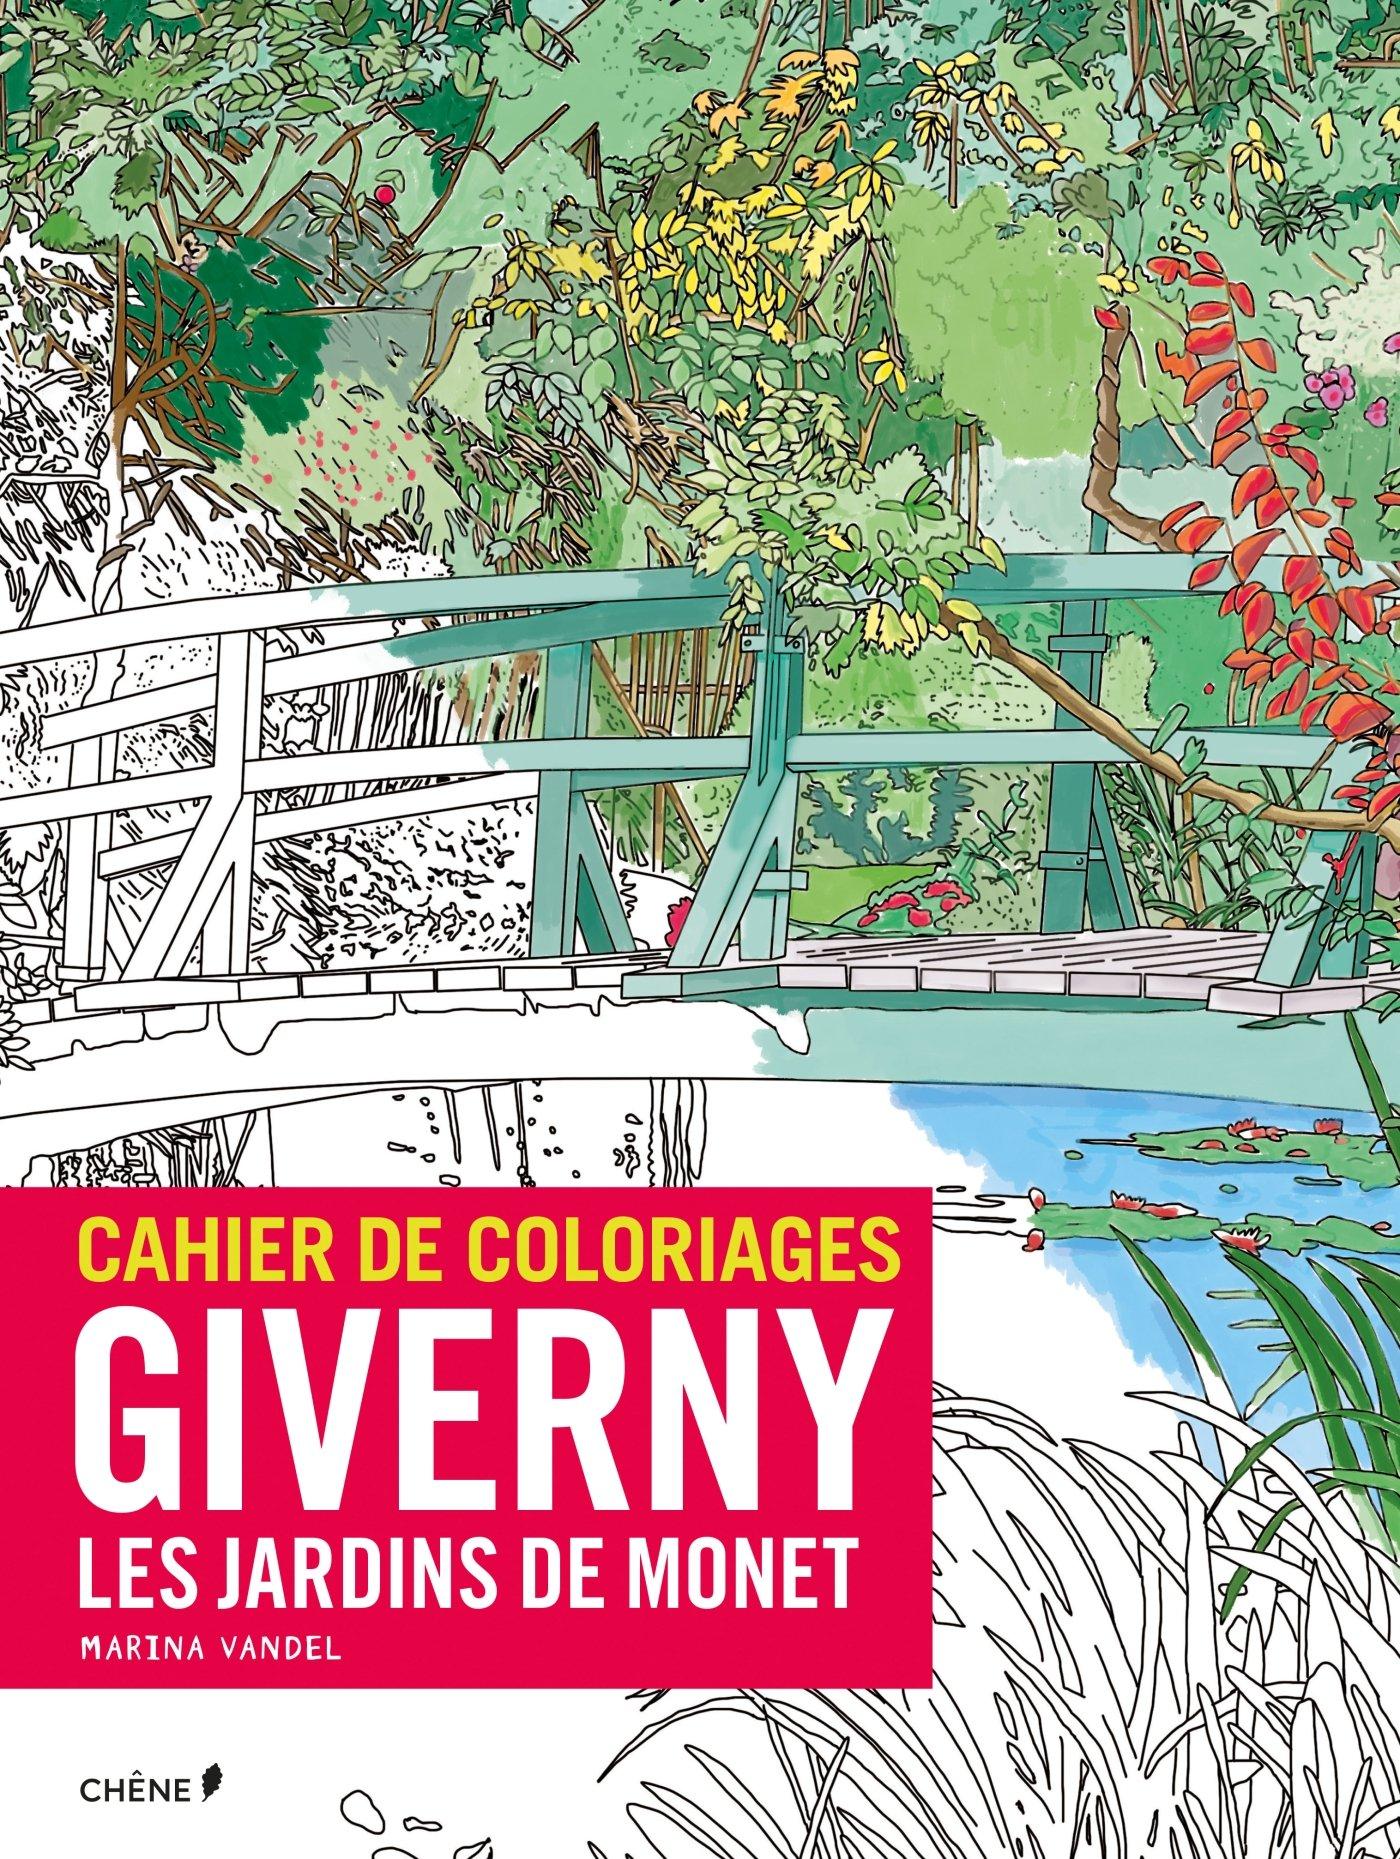 Amazon Cahier de coloriages Giverny les jardins de Monet Marina Vandel Livres